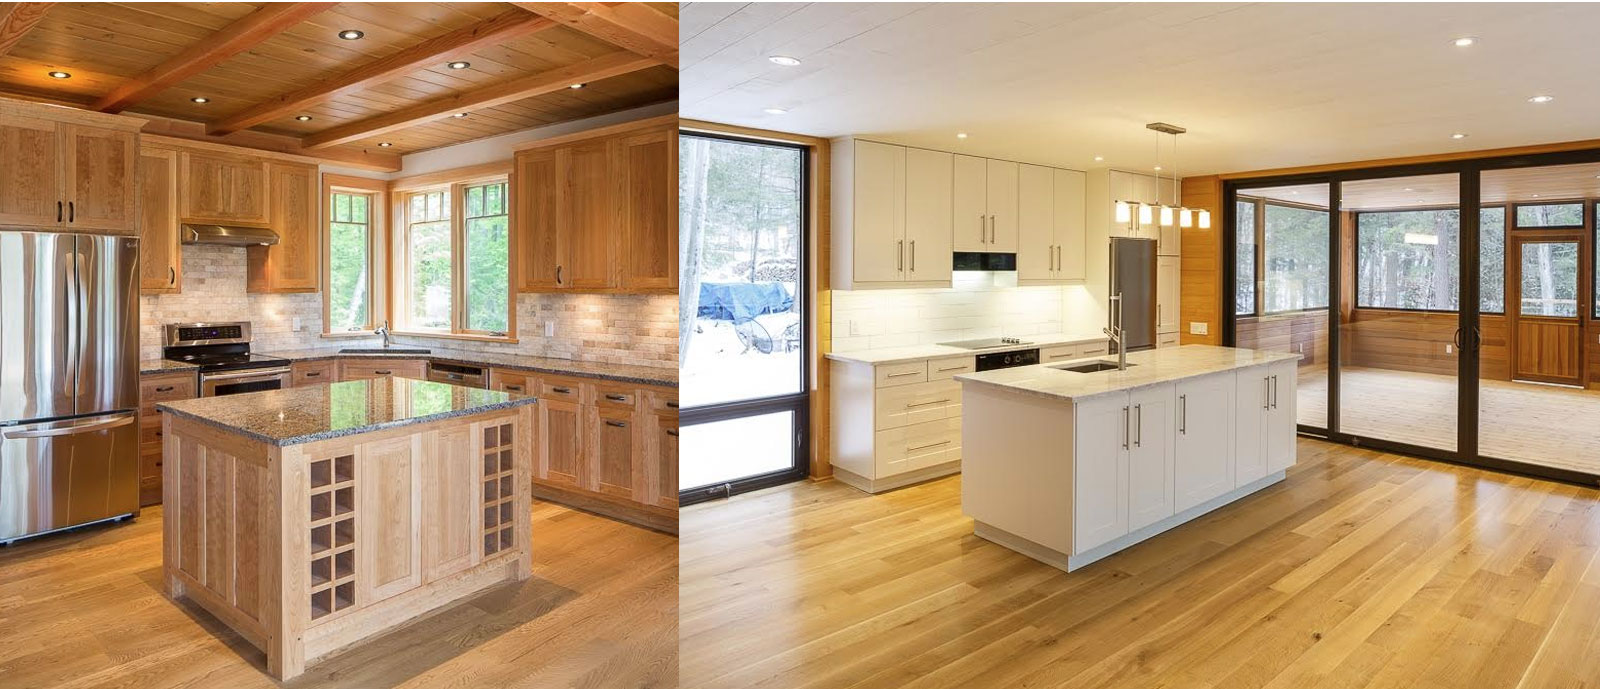 hardwood in kitchens flooring gallery